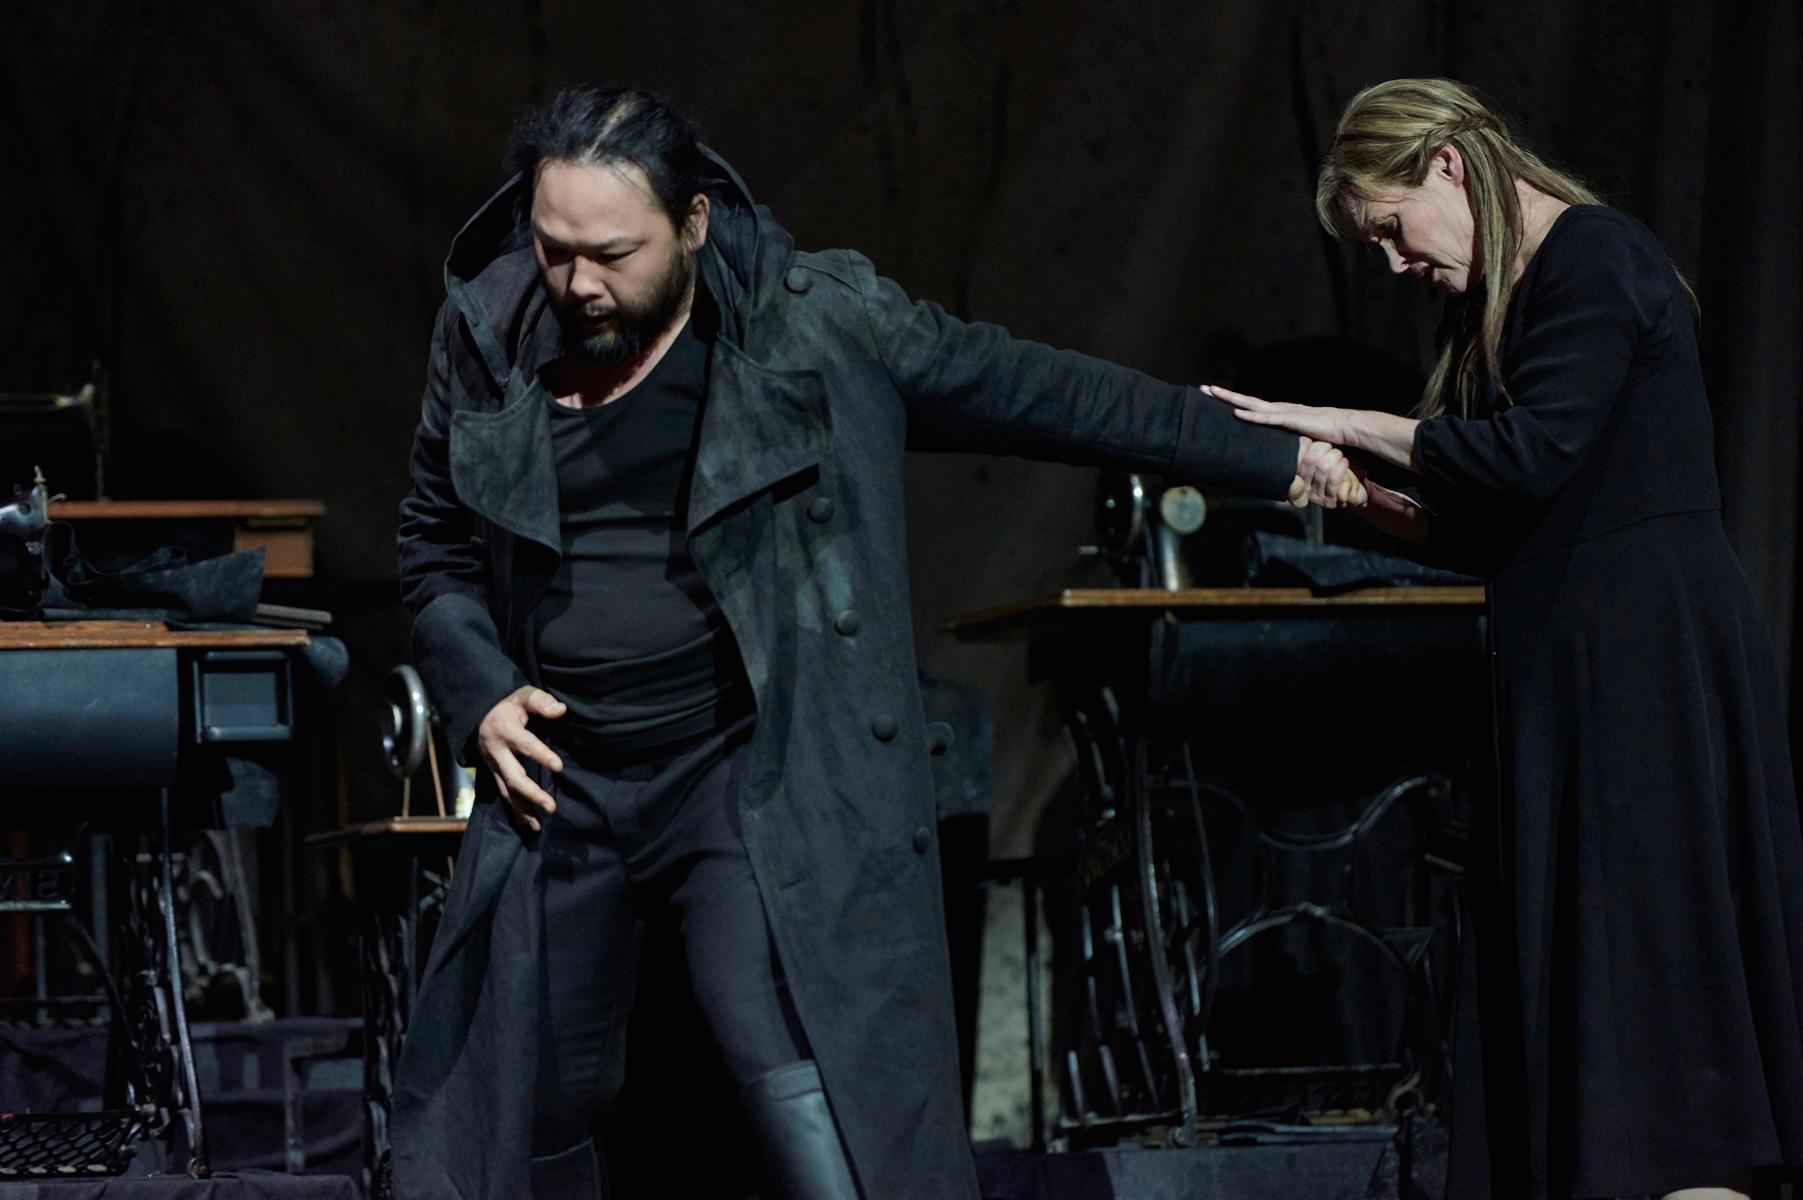 Samuel Youn als Holländer, Ingela Brimberg als Senta